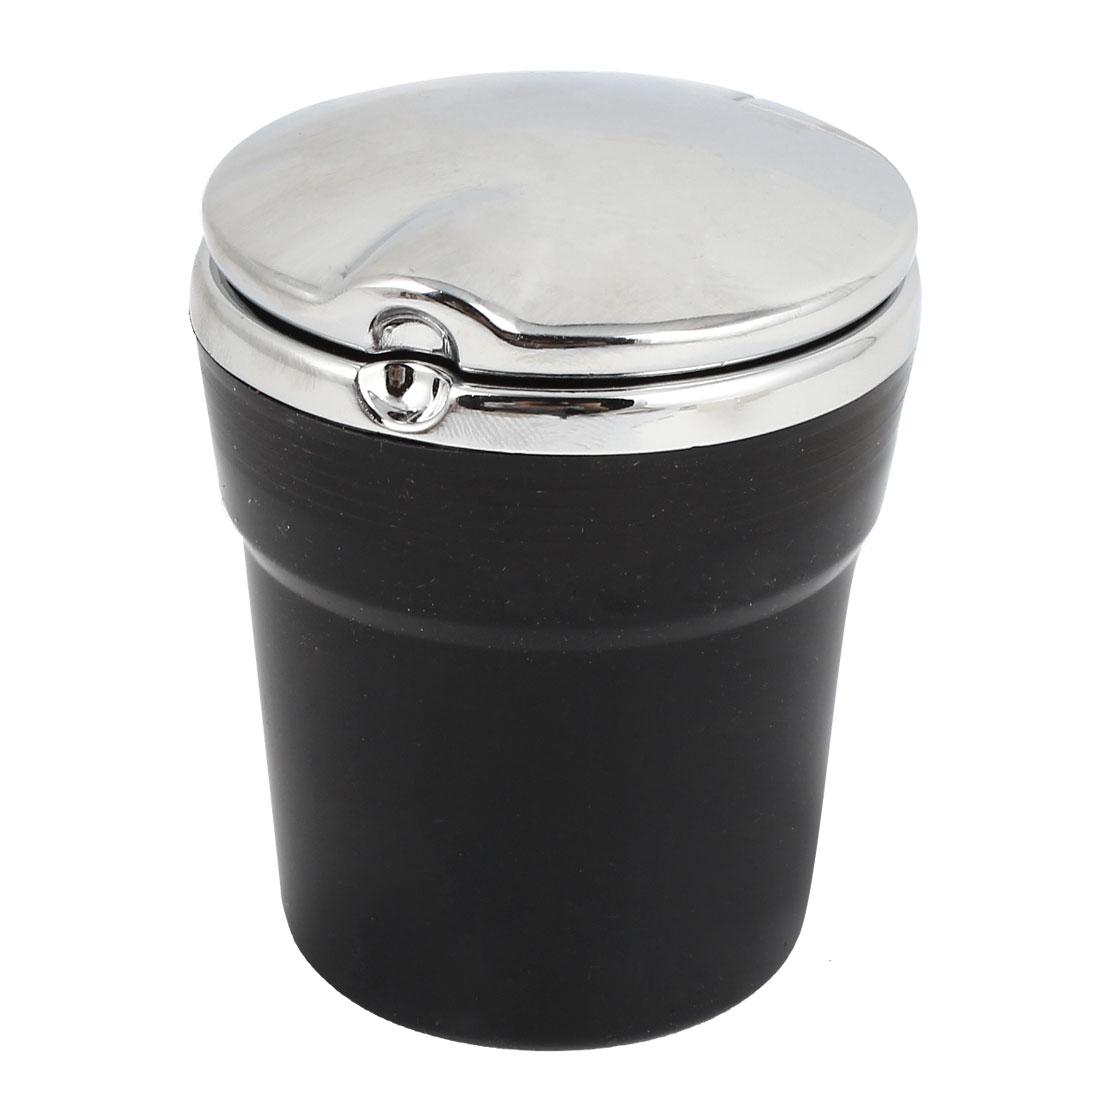 Black Silver Tone Cylinder Shaped Blue LED Light Car Smoking Cigarette Ashtray Holder